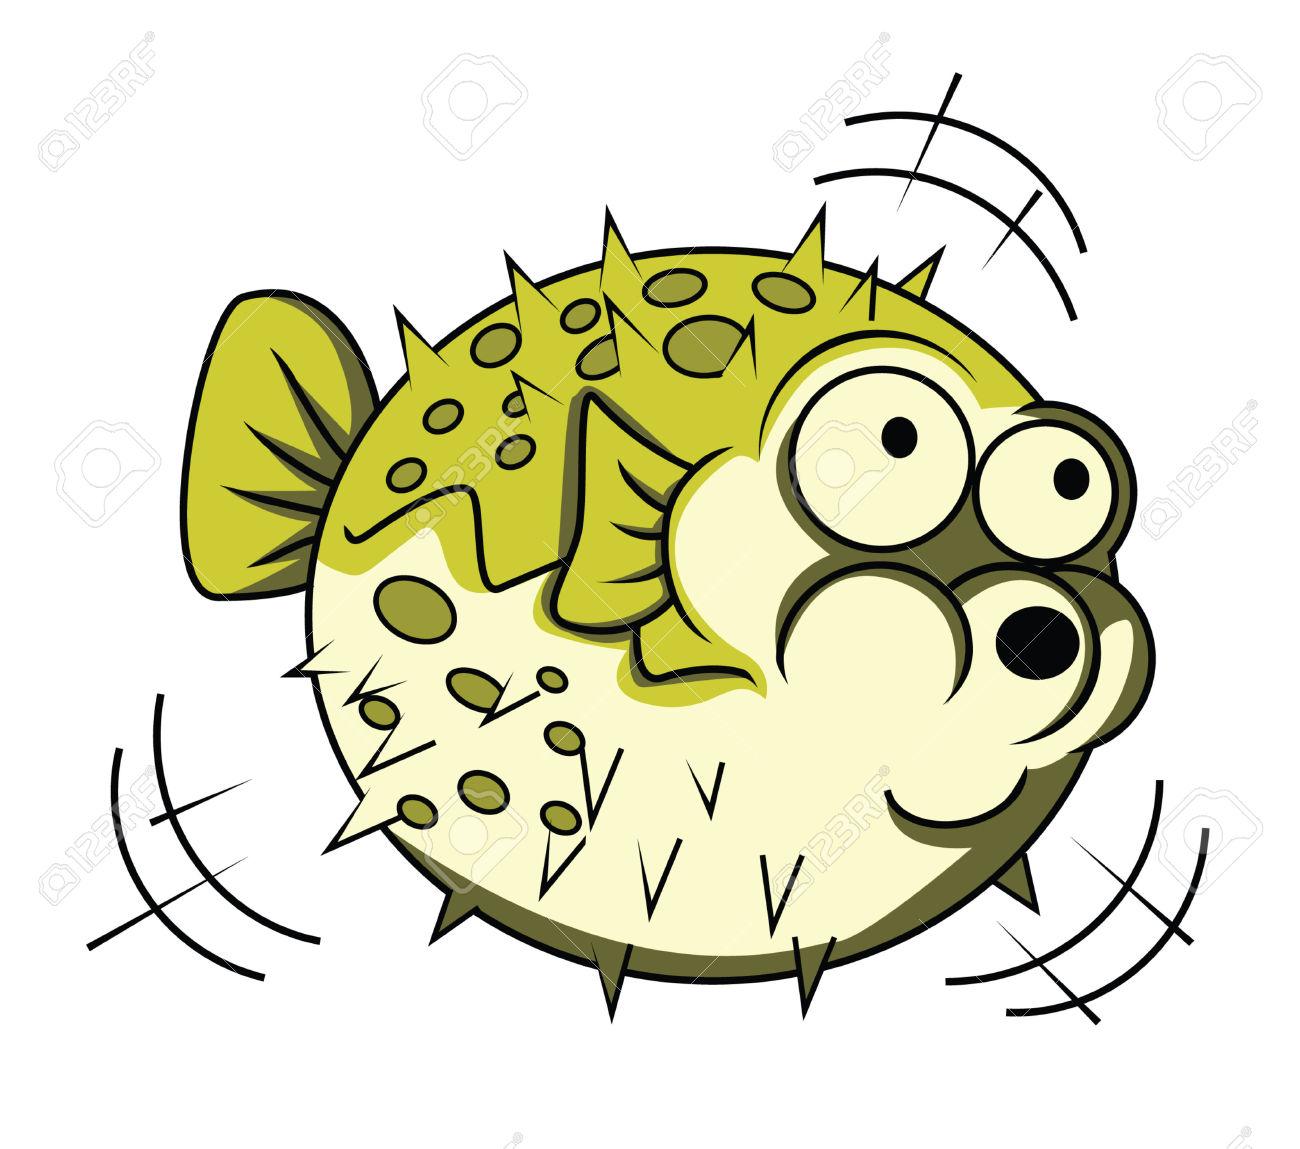 Blowfish clipart #16, Download drawings